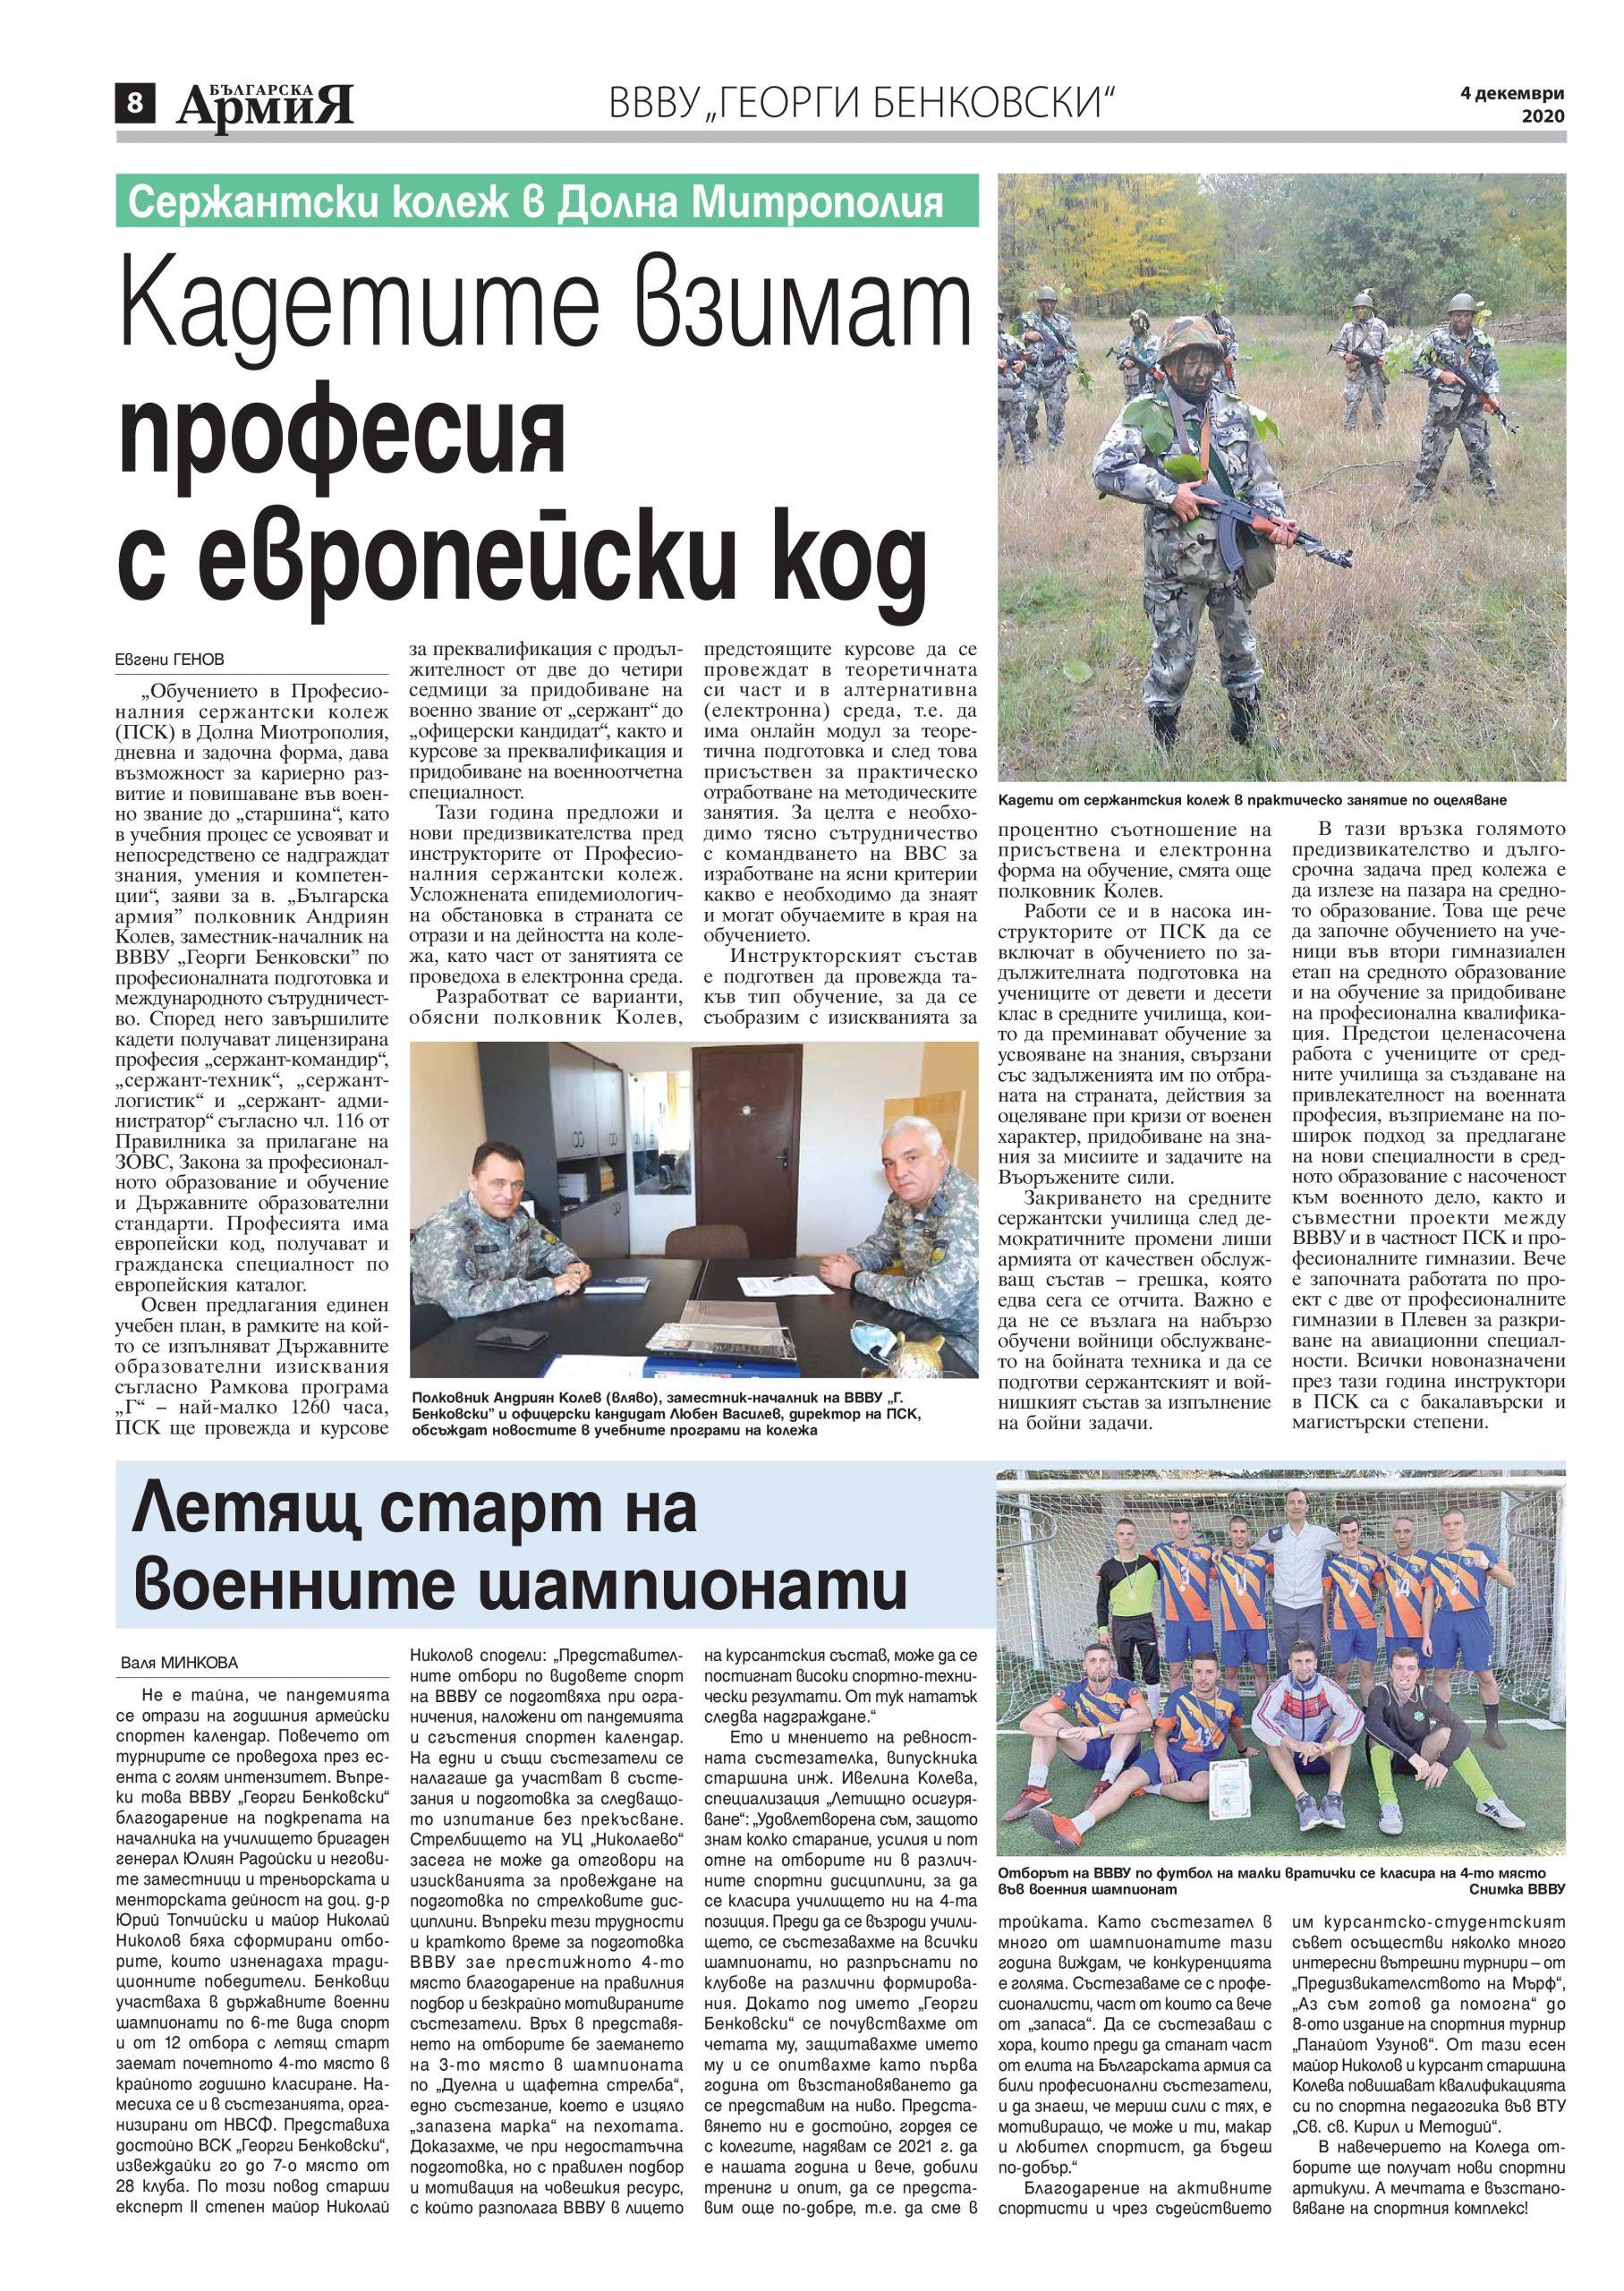 https://armymedia.bg/wp-content/uploads/2015/06/08-50-scaled.jpg